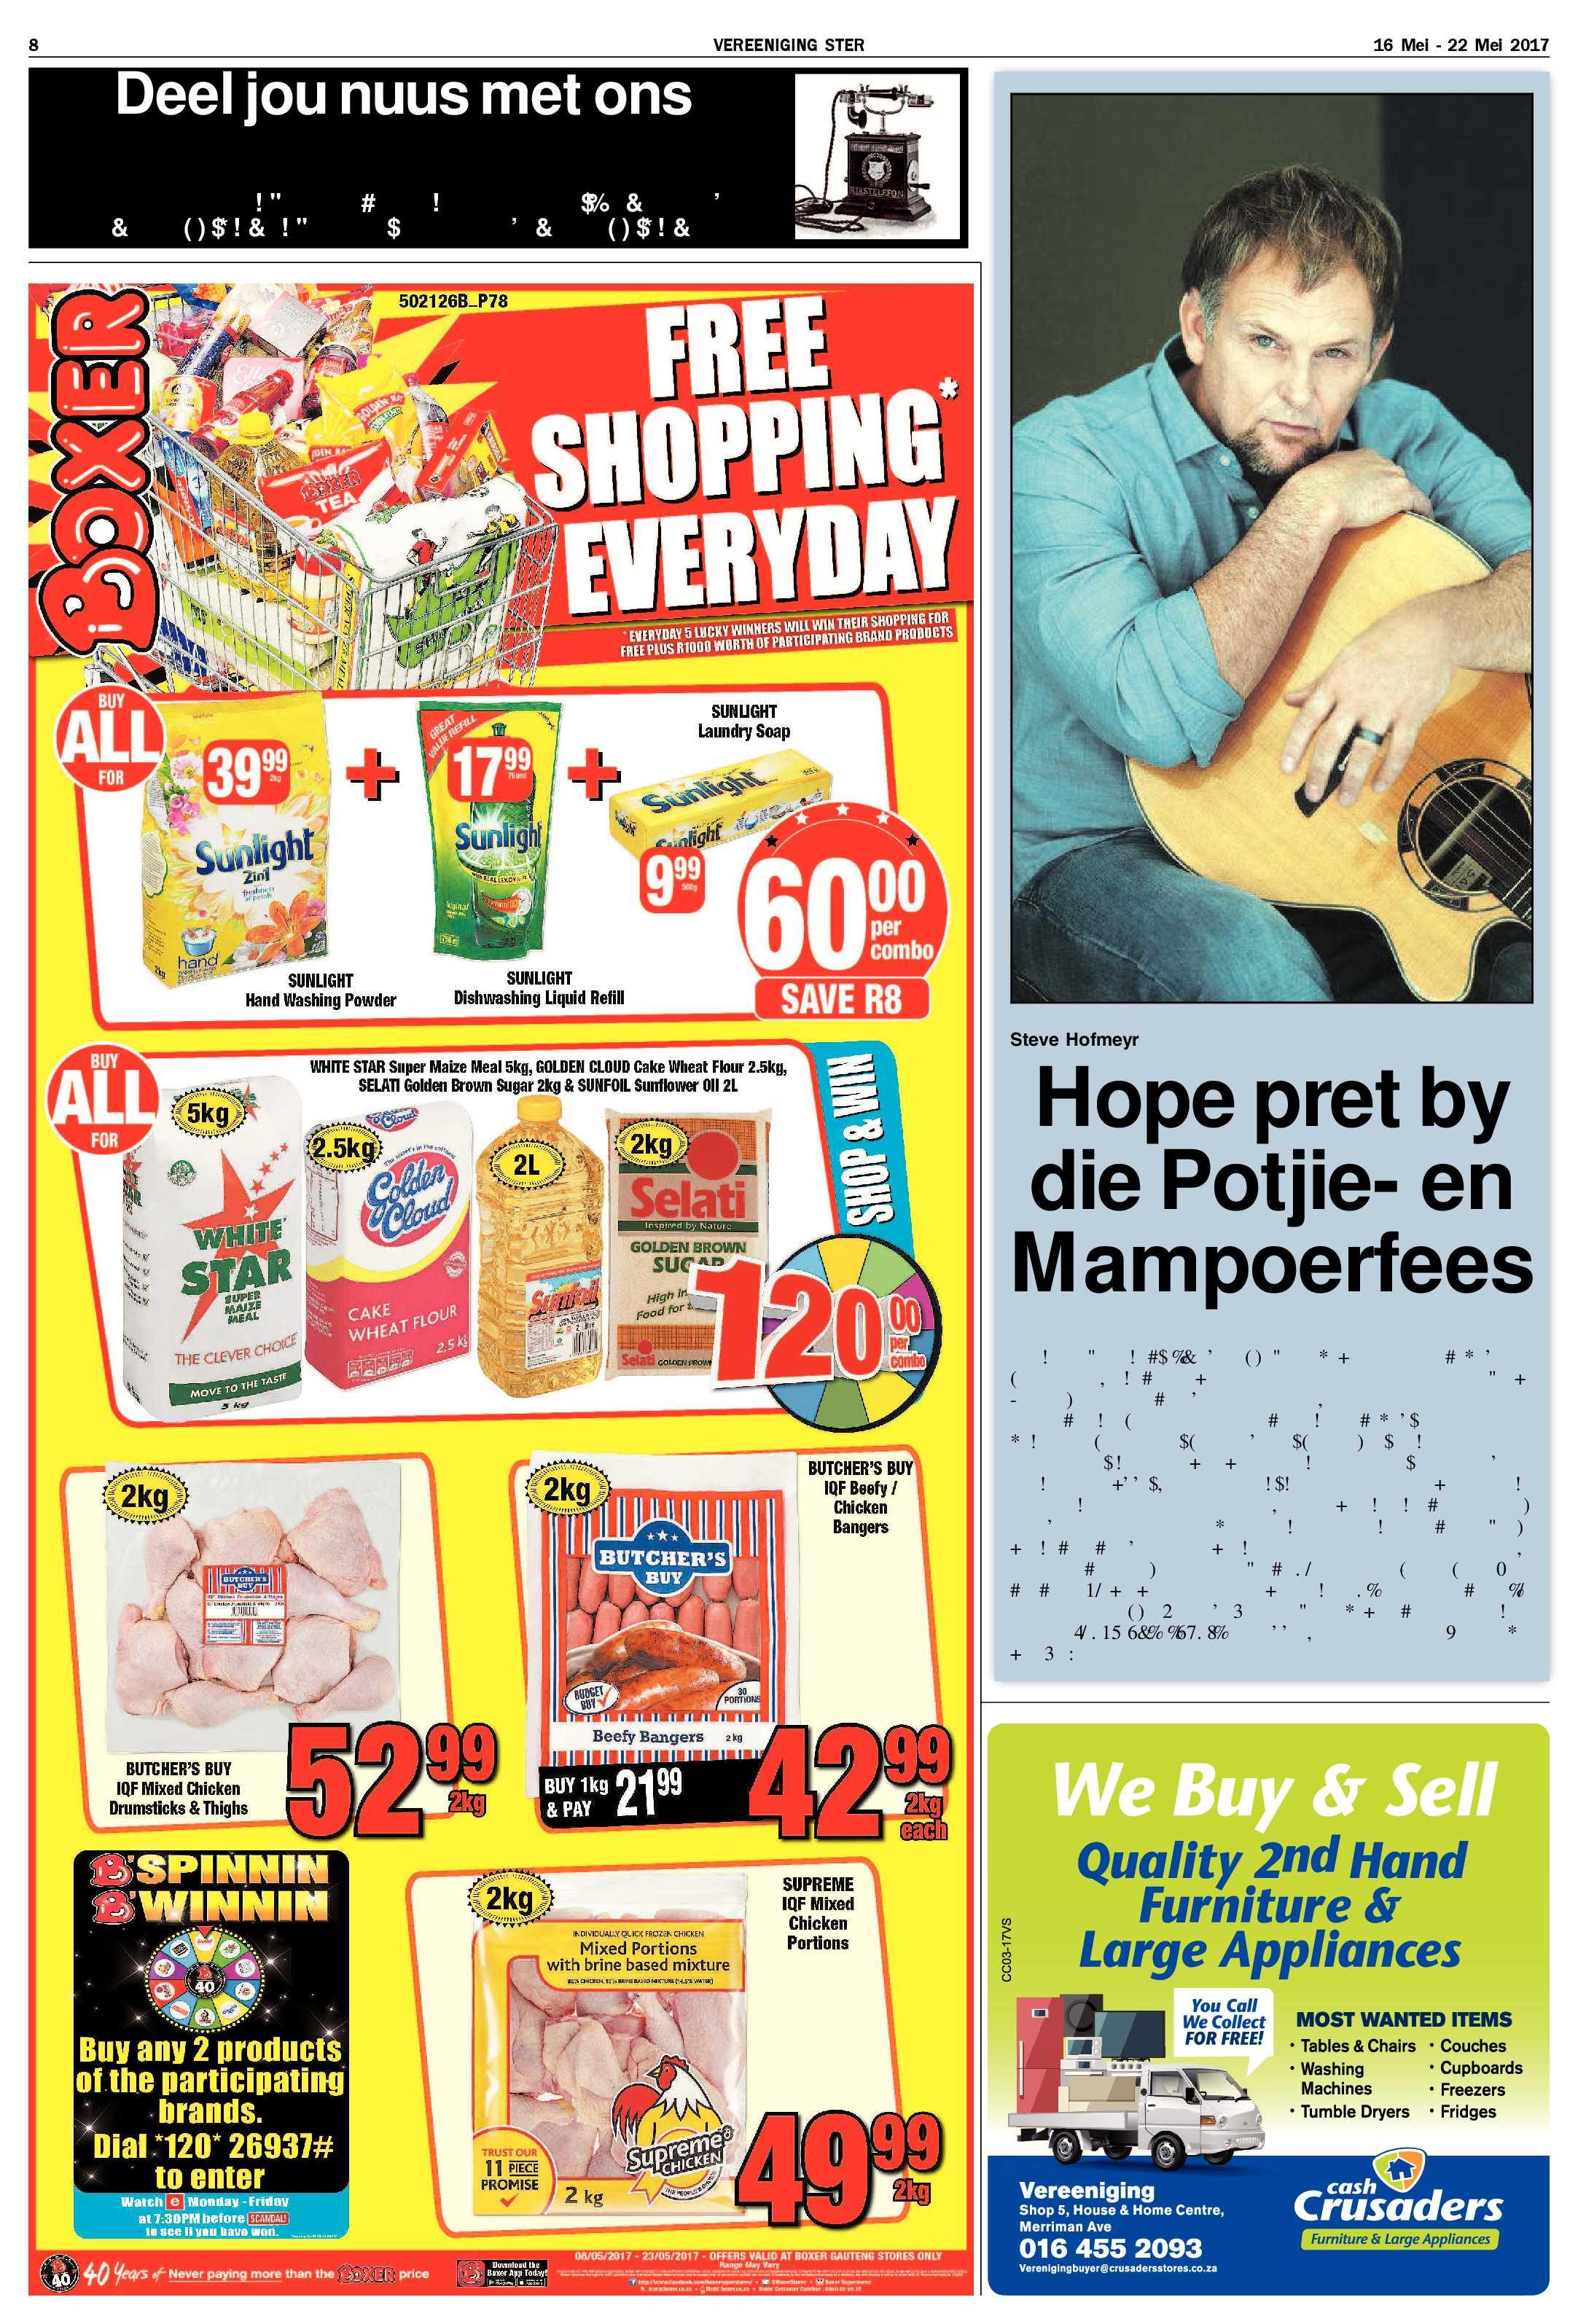 vereeniging-ster-16-22-mei-2017-epapers-page-8